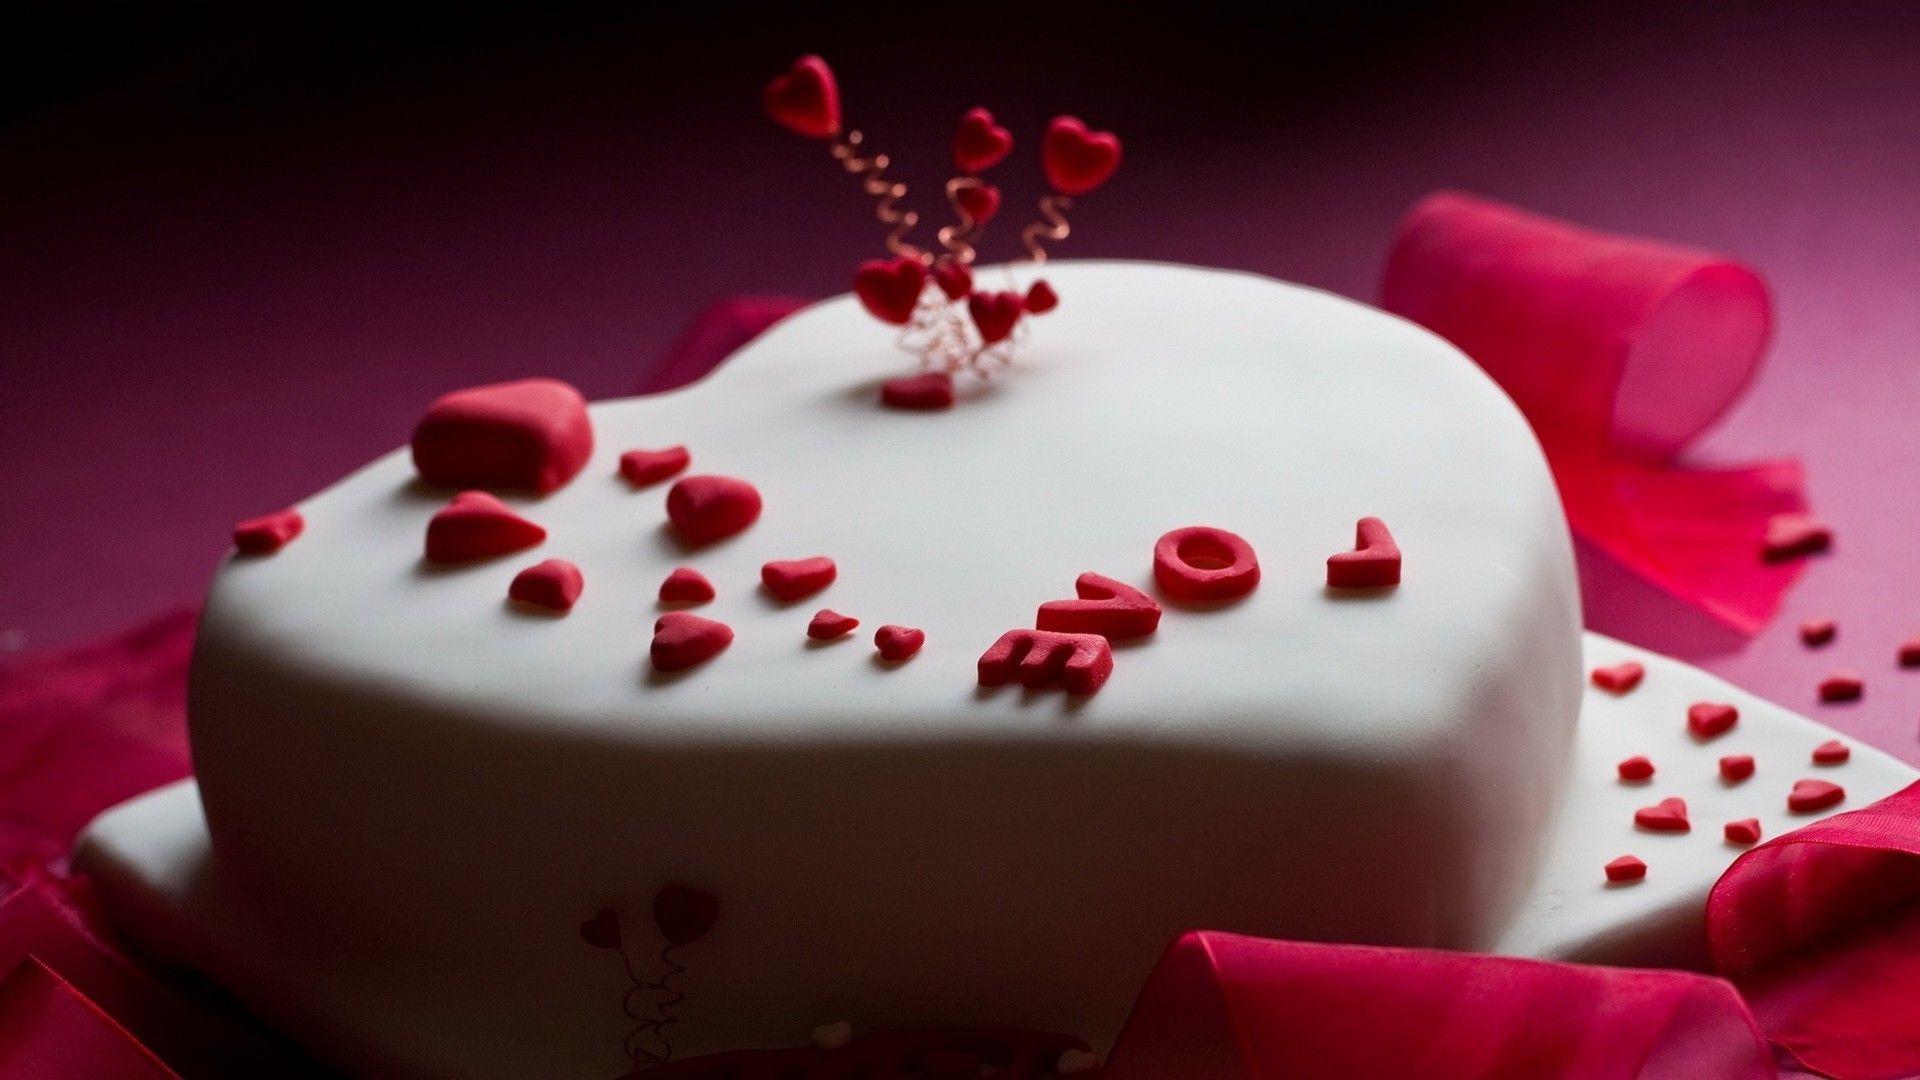 Birthday Cake Cool HD Wallpaper